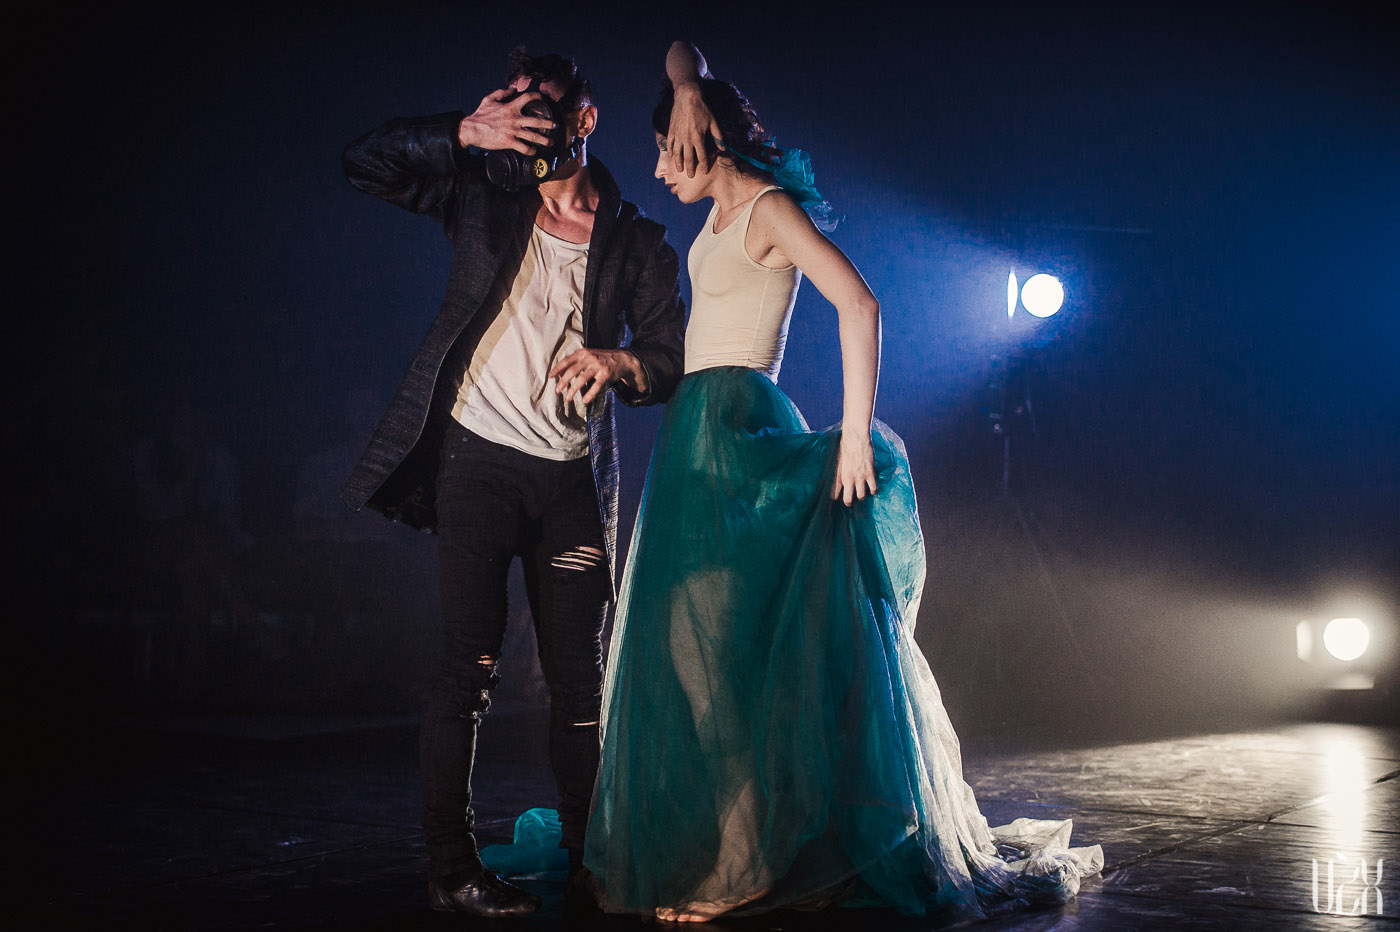 E.sabaliauskaite Vzx.lt Faustas Teatras Event 020